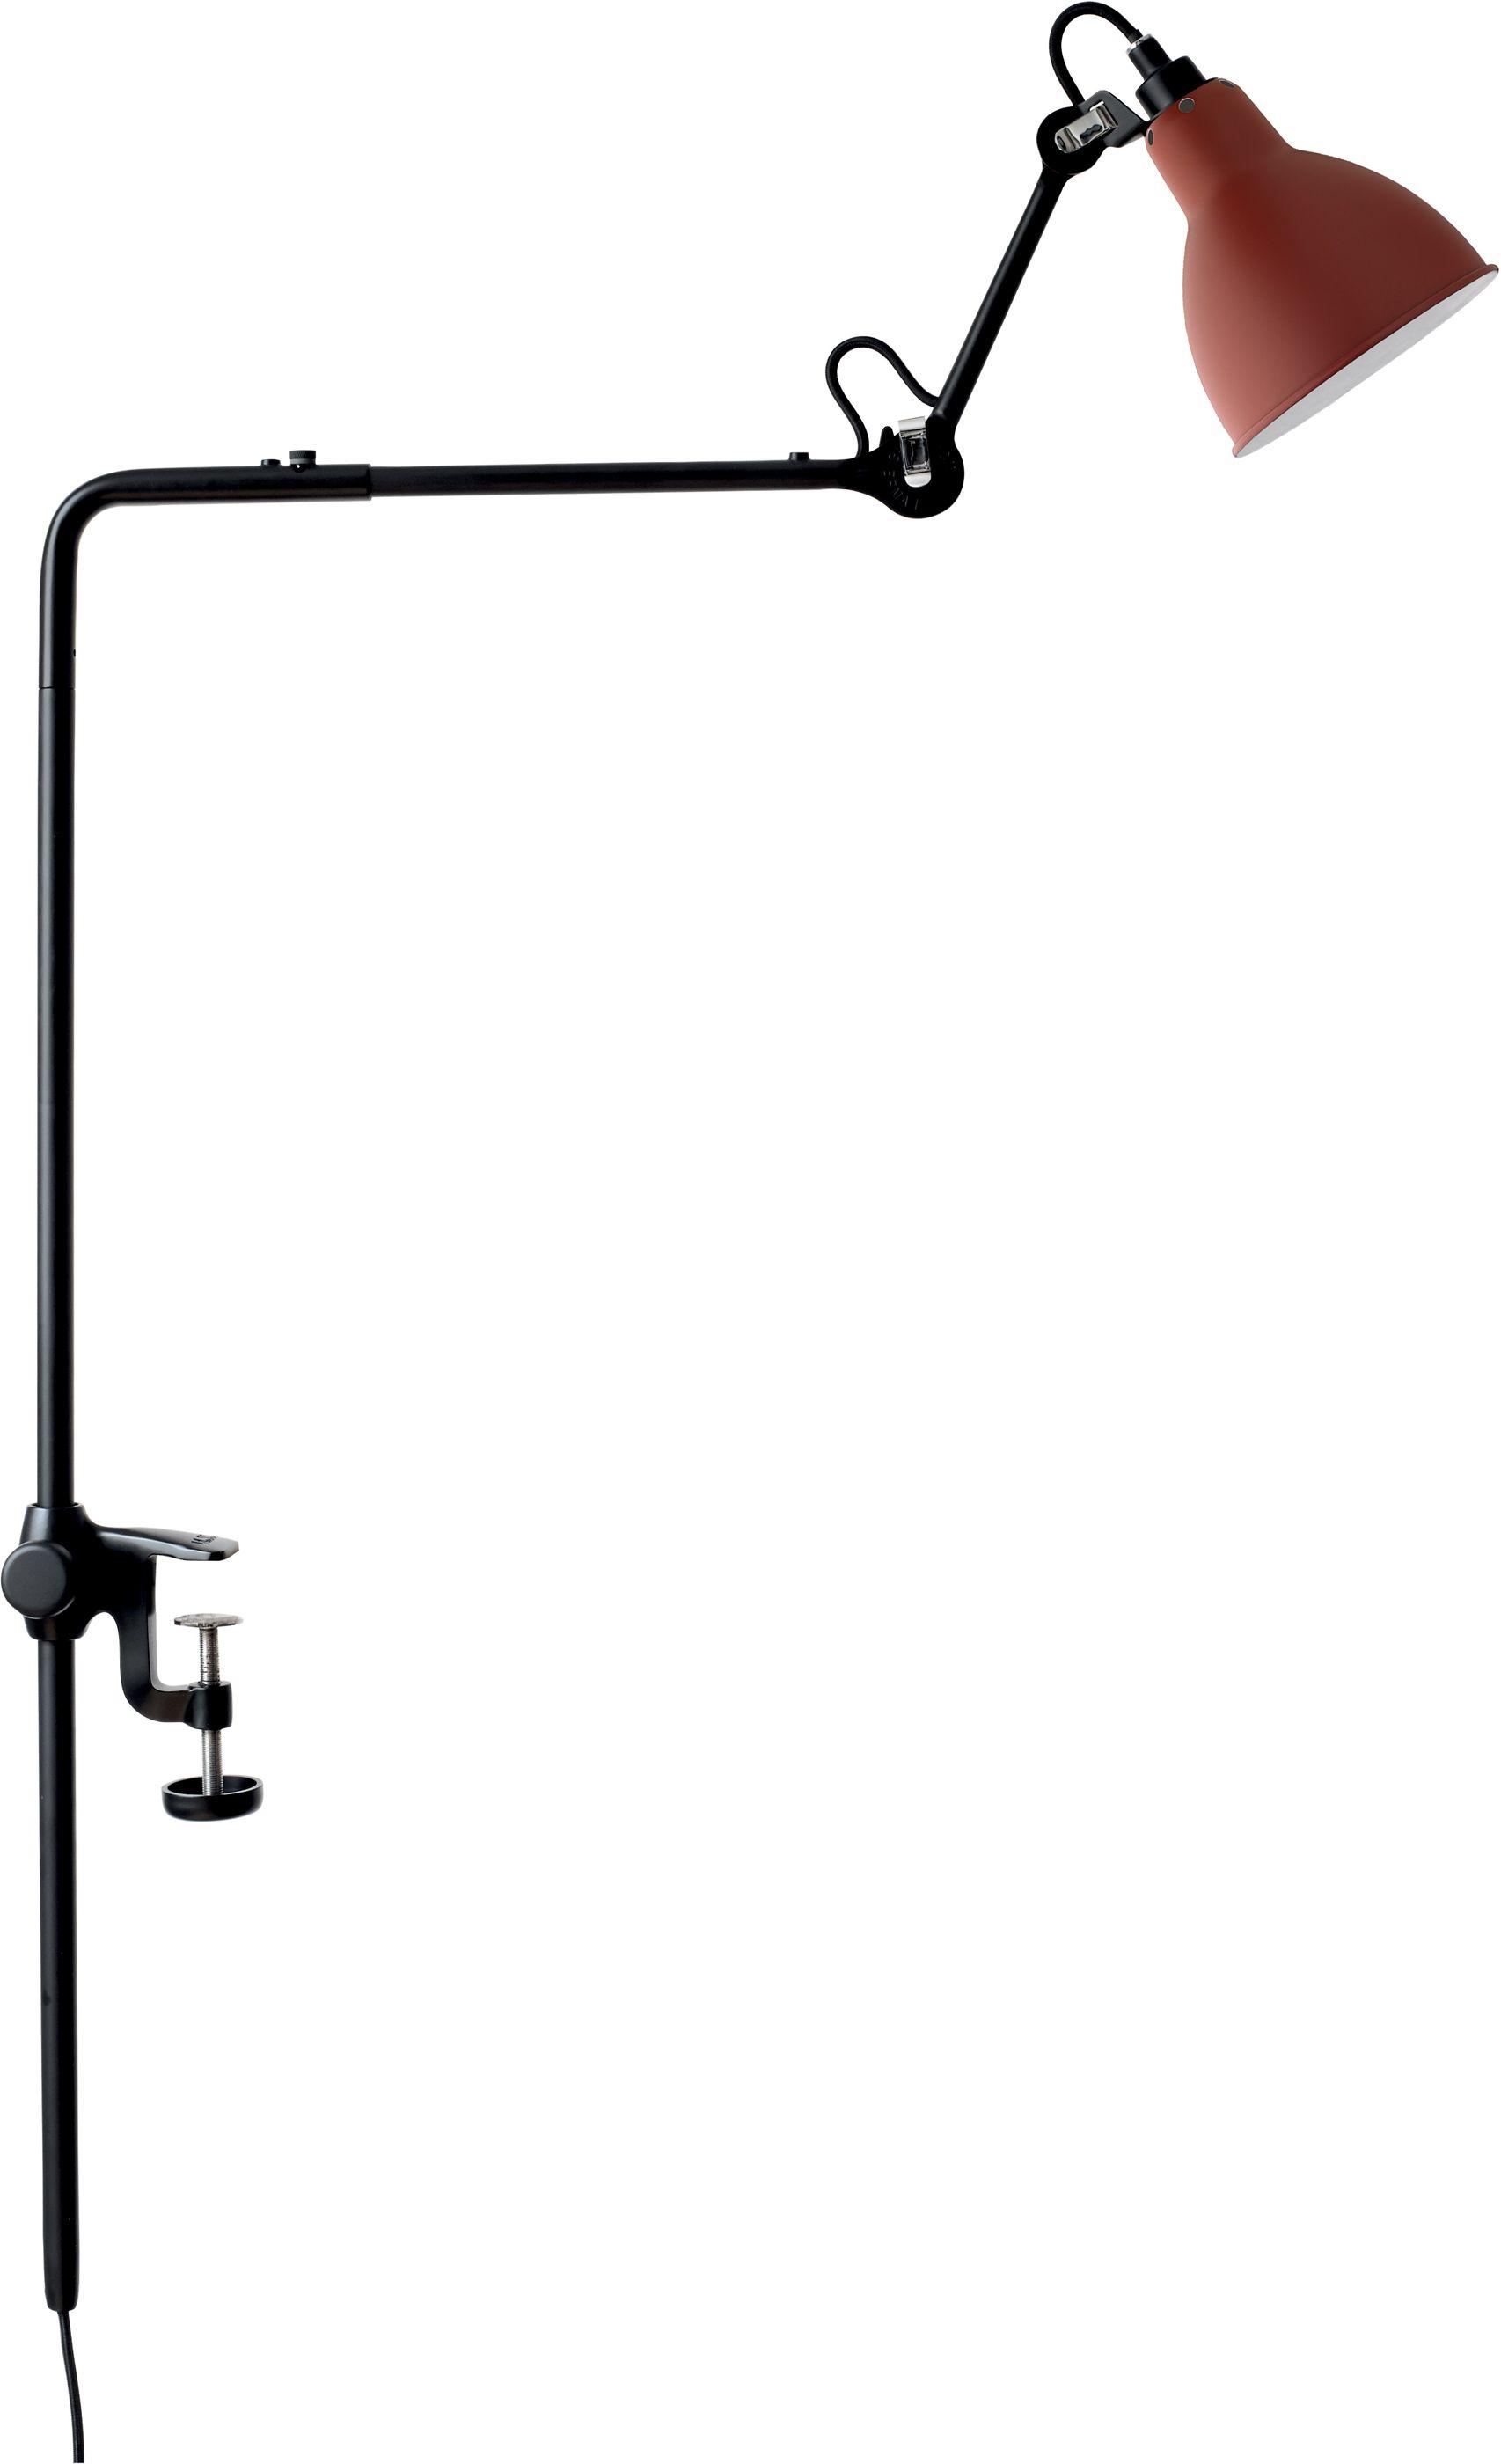 DCW éditions Lampe Gras N226 bureaulamp met tafelklem Rood